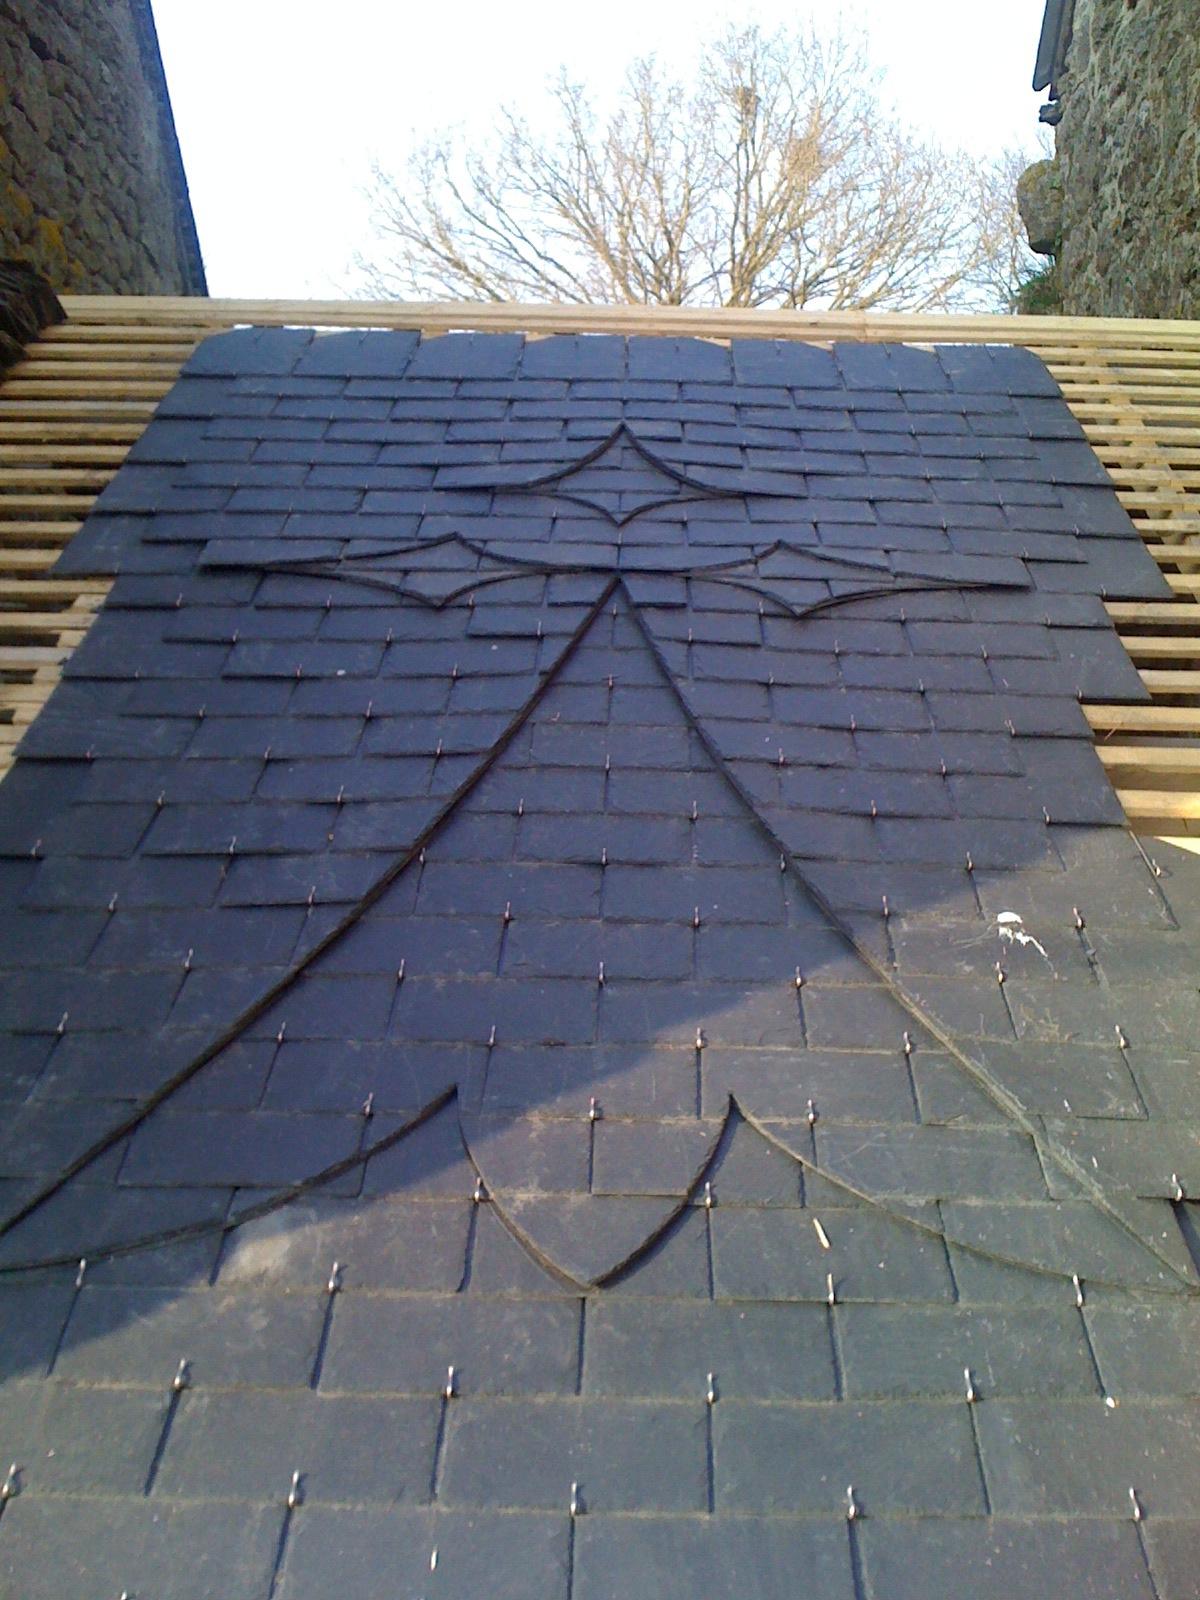 Dessin sur toiture ardoise - Crochet toiture ardoise ...